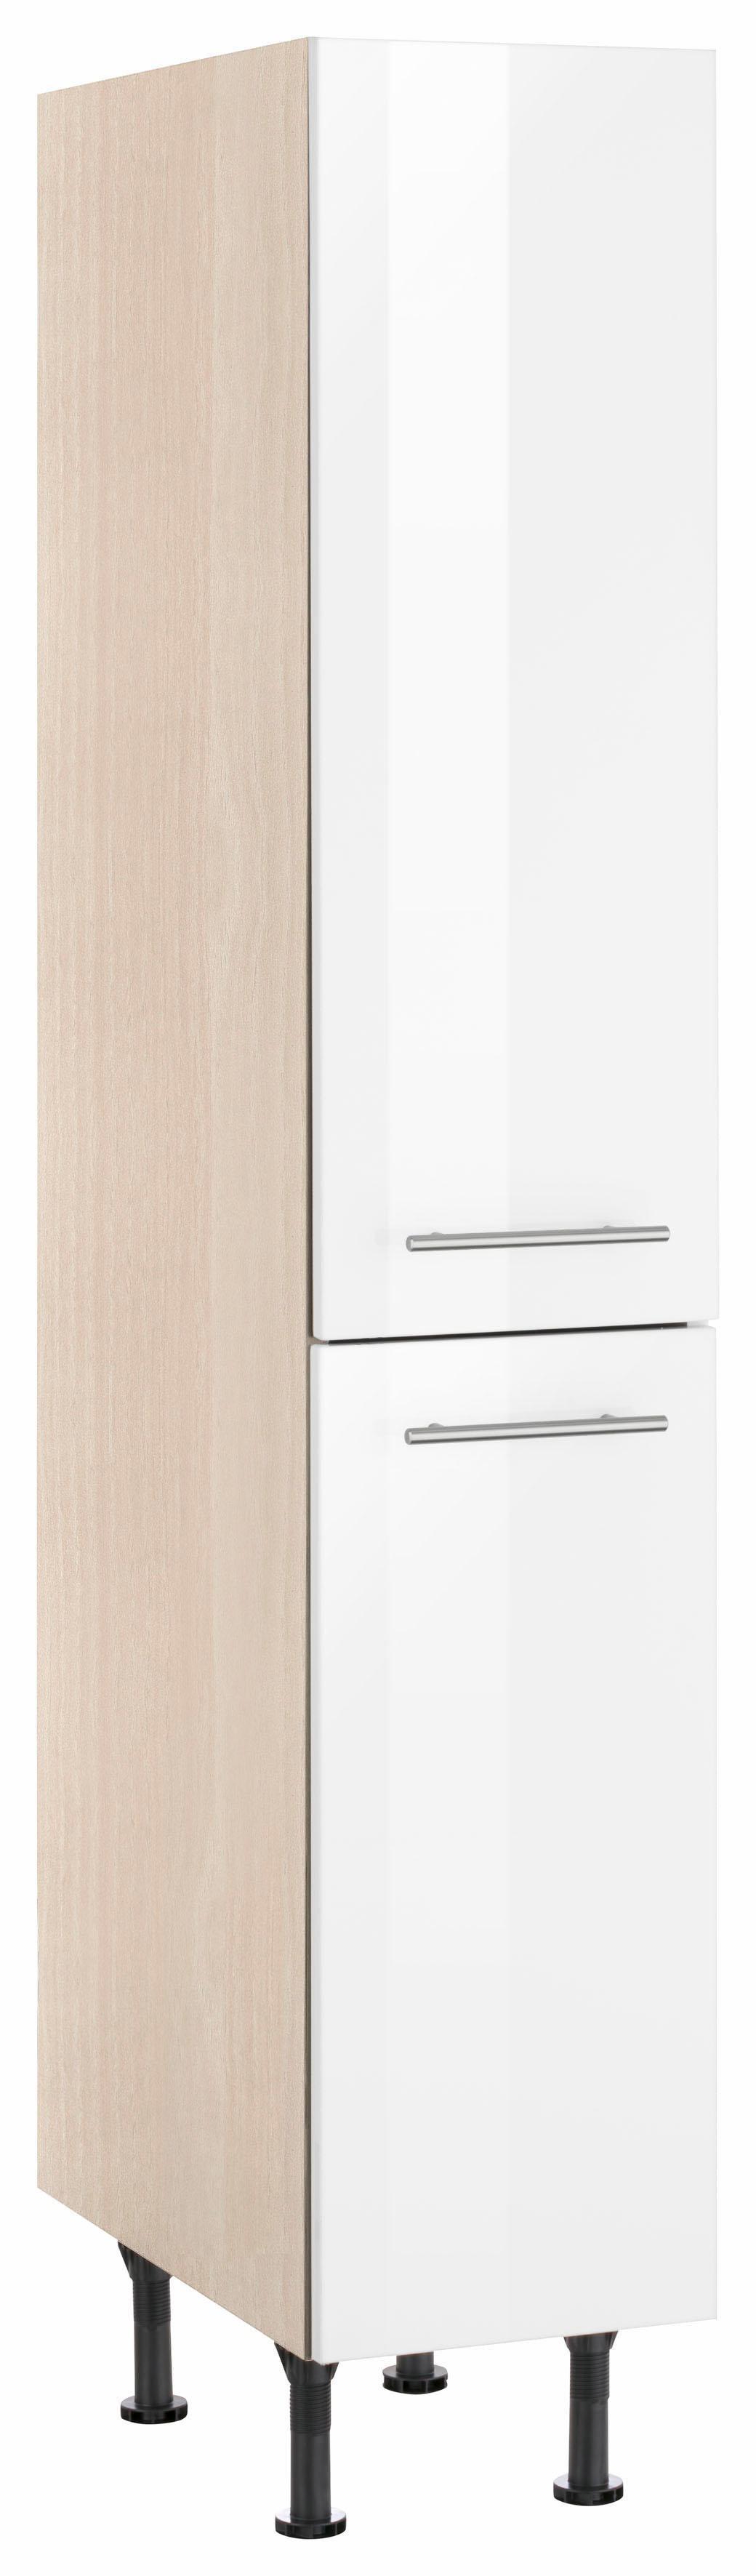 OPTIFIT Apothekerschrank Bern   Küche und Esszimmer > Küchenschränke > Apothekerschränke   Weiß   Nachbildung - Edelstahl - Melamin   Optifit